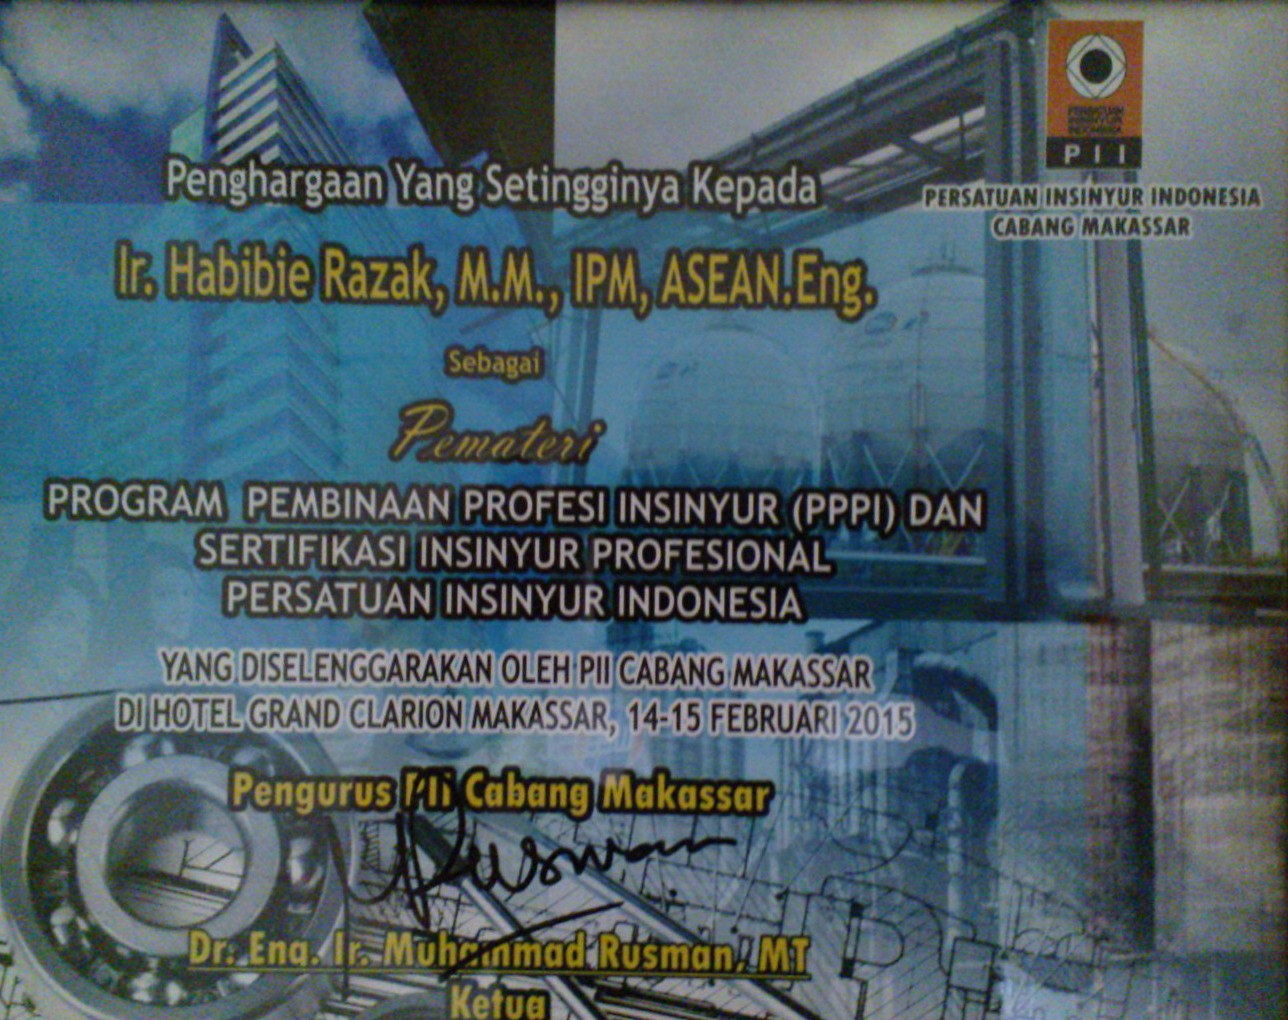 PII Speaker's Certificate_edit_edit